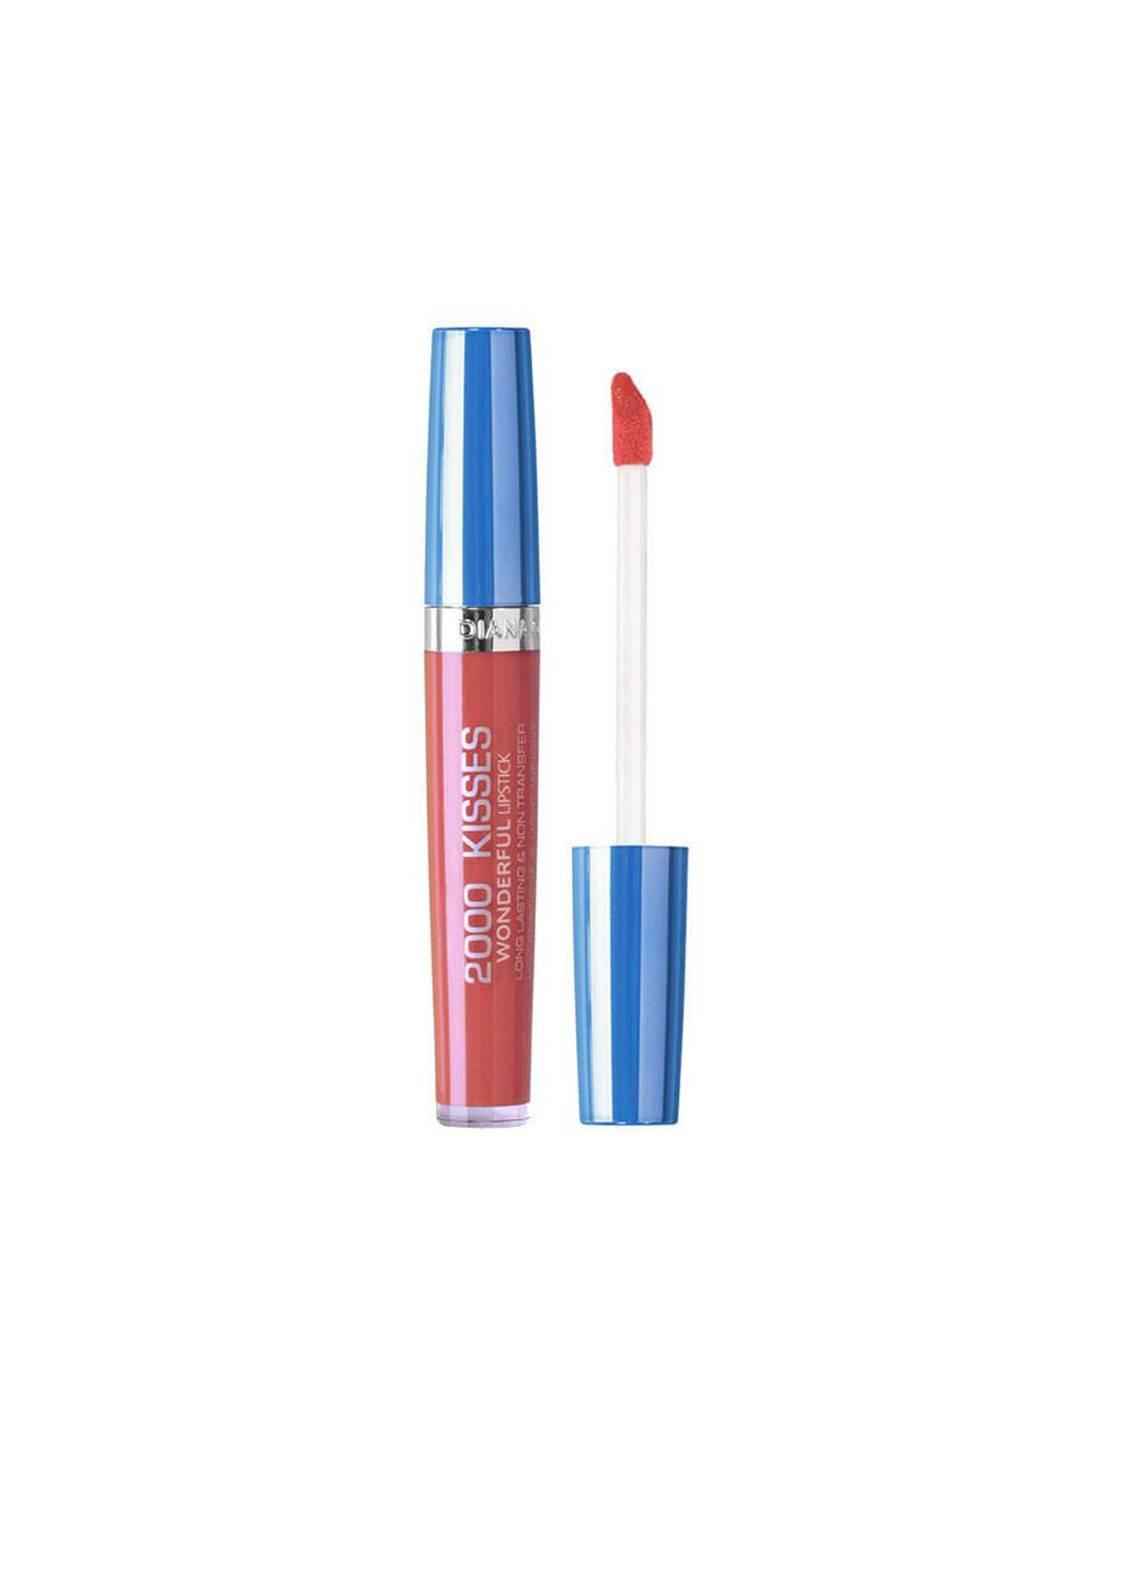 Diana Of London 2000 Kisses Wonderful Lipstick - Pure Temptation - 38